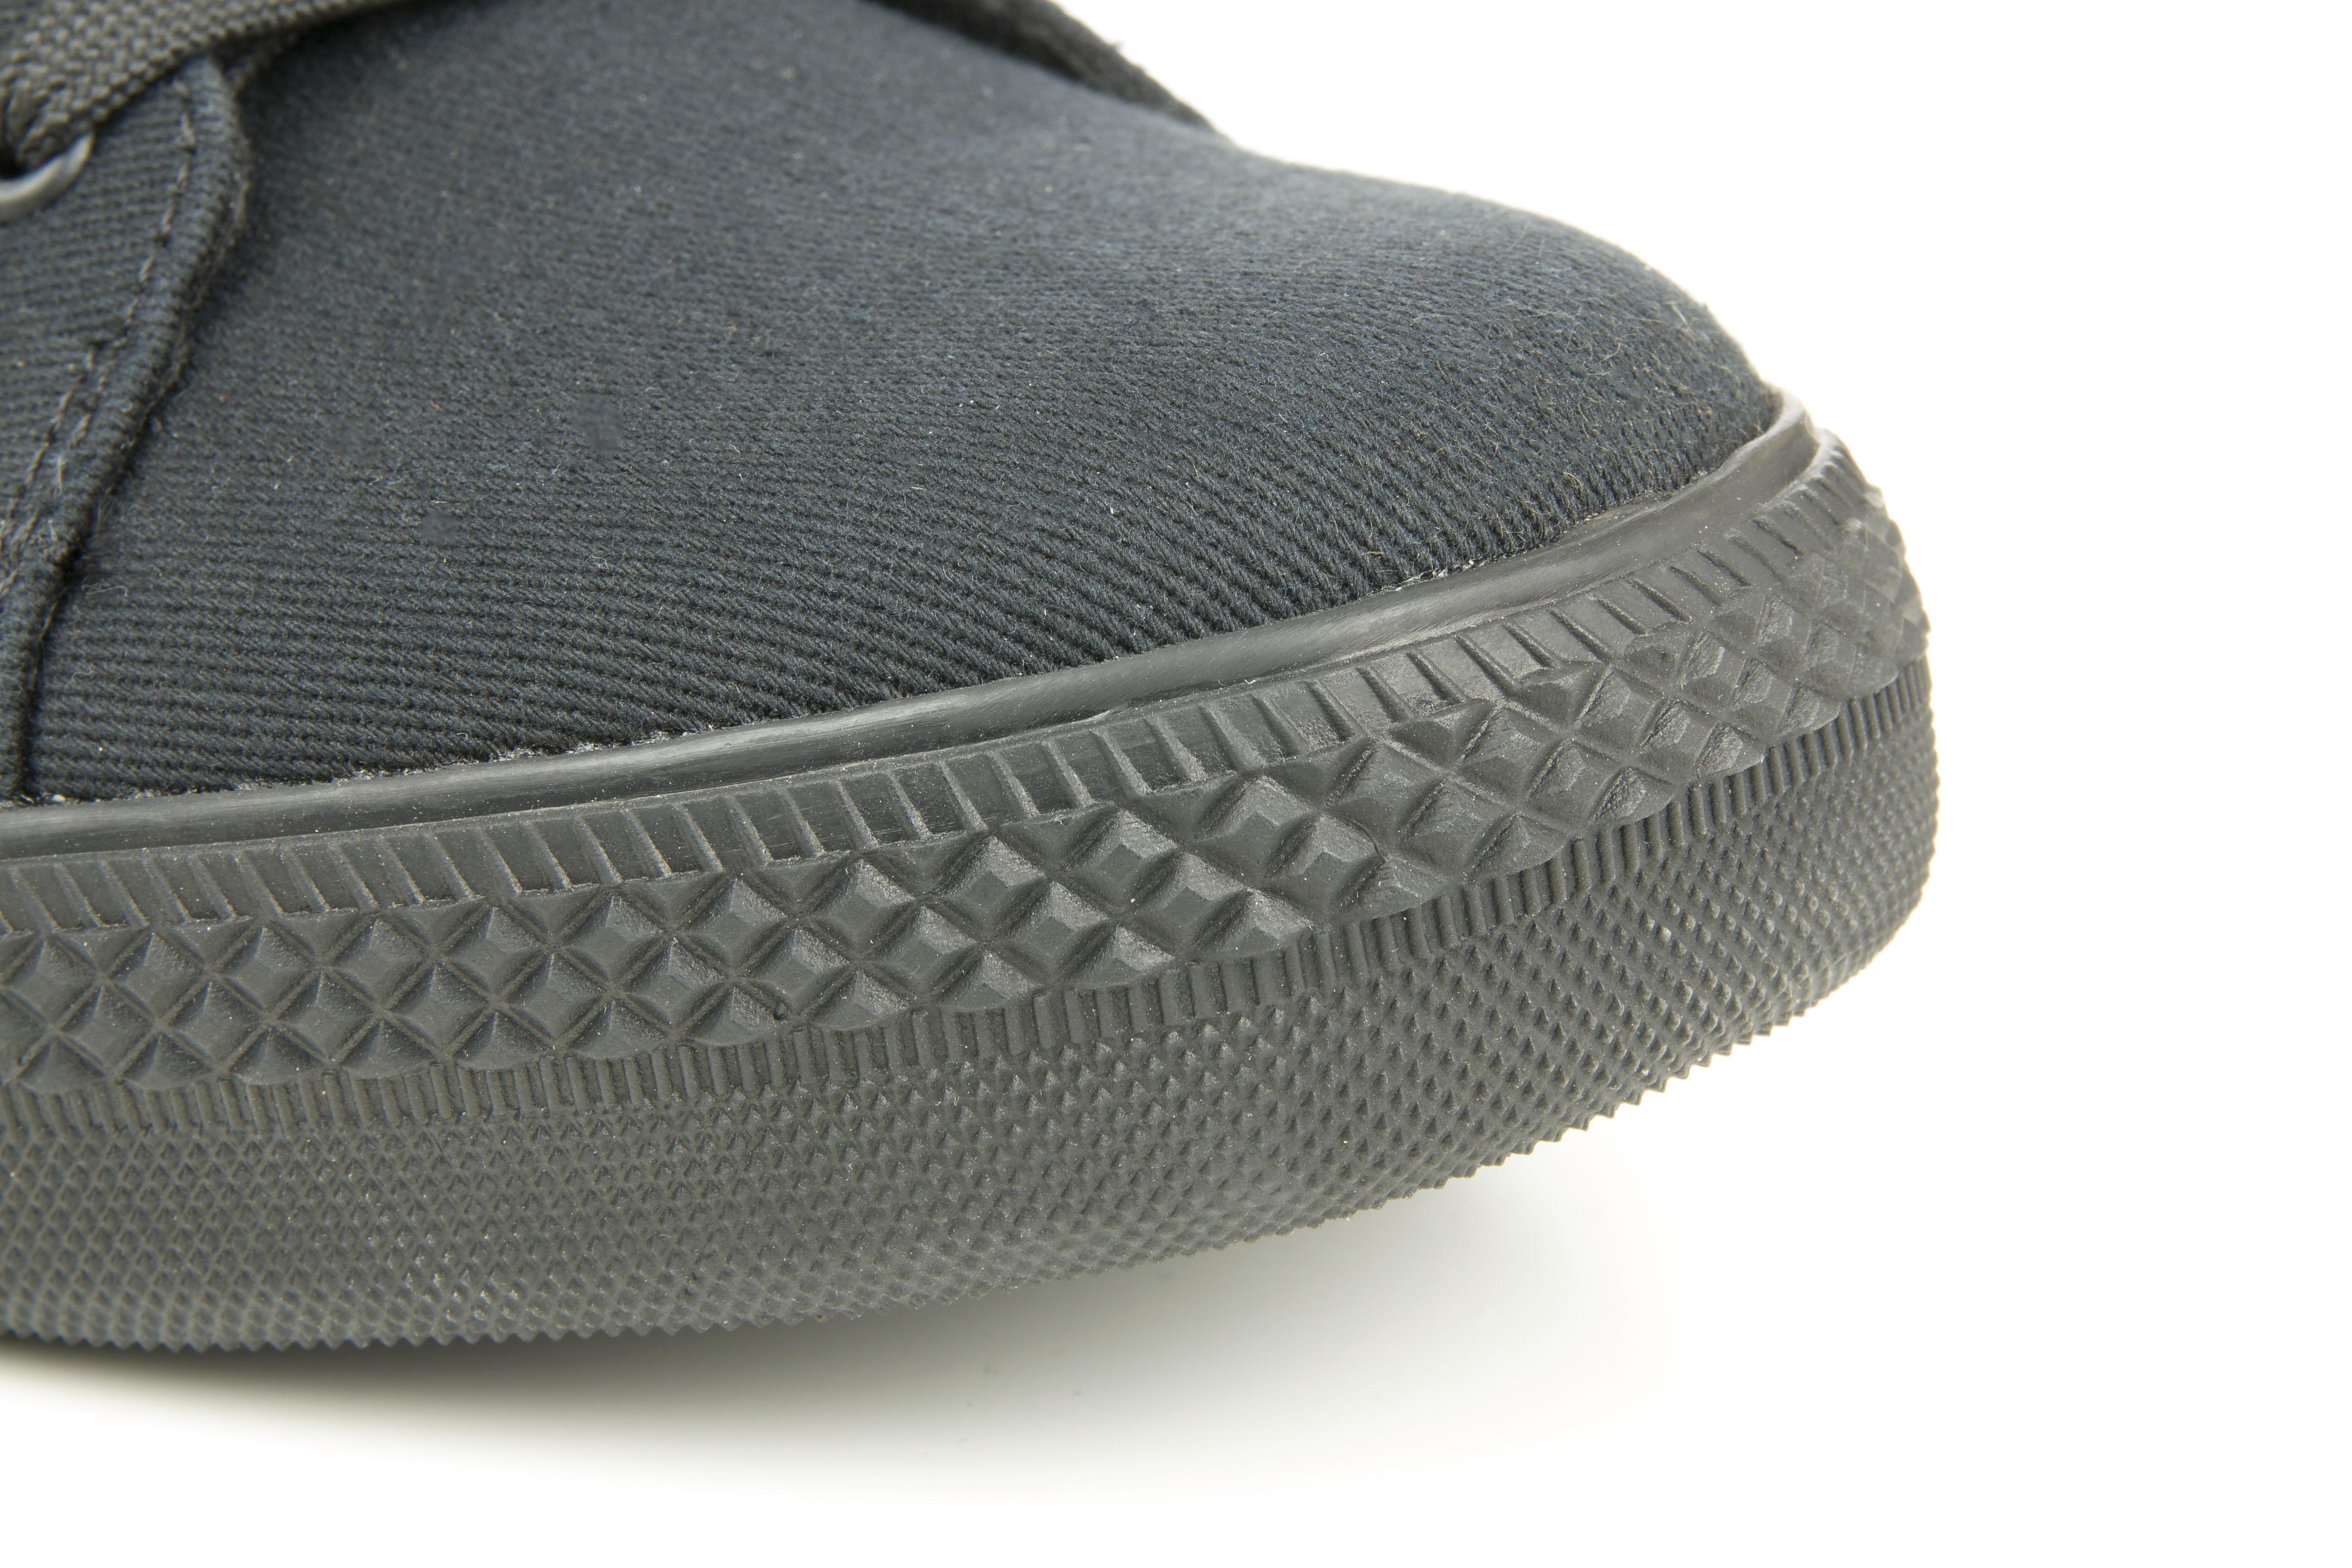 36221d3acac Popis · Dotazy · Hlídač. Nové boty od firmy Fox Chunk Camo Casual Trainers  ...